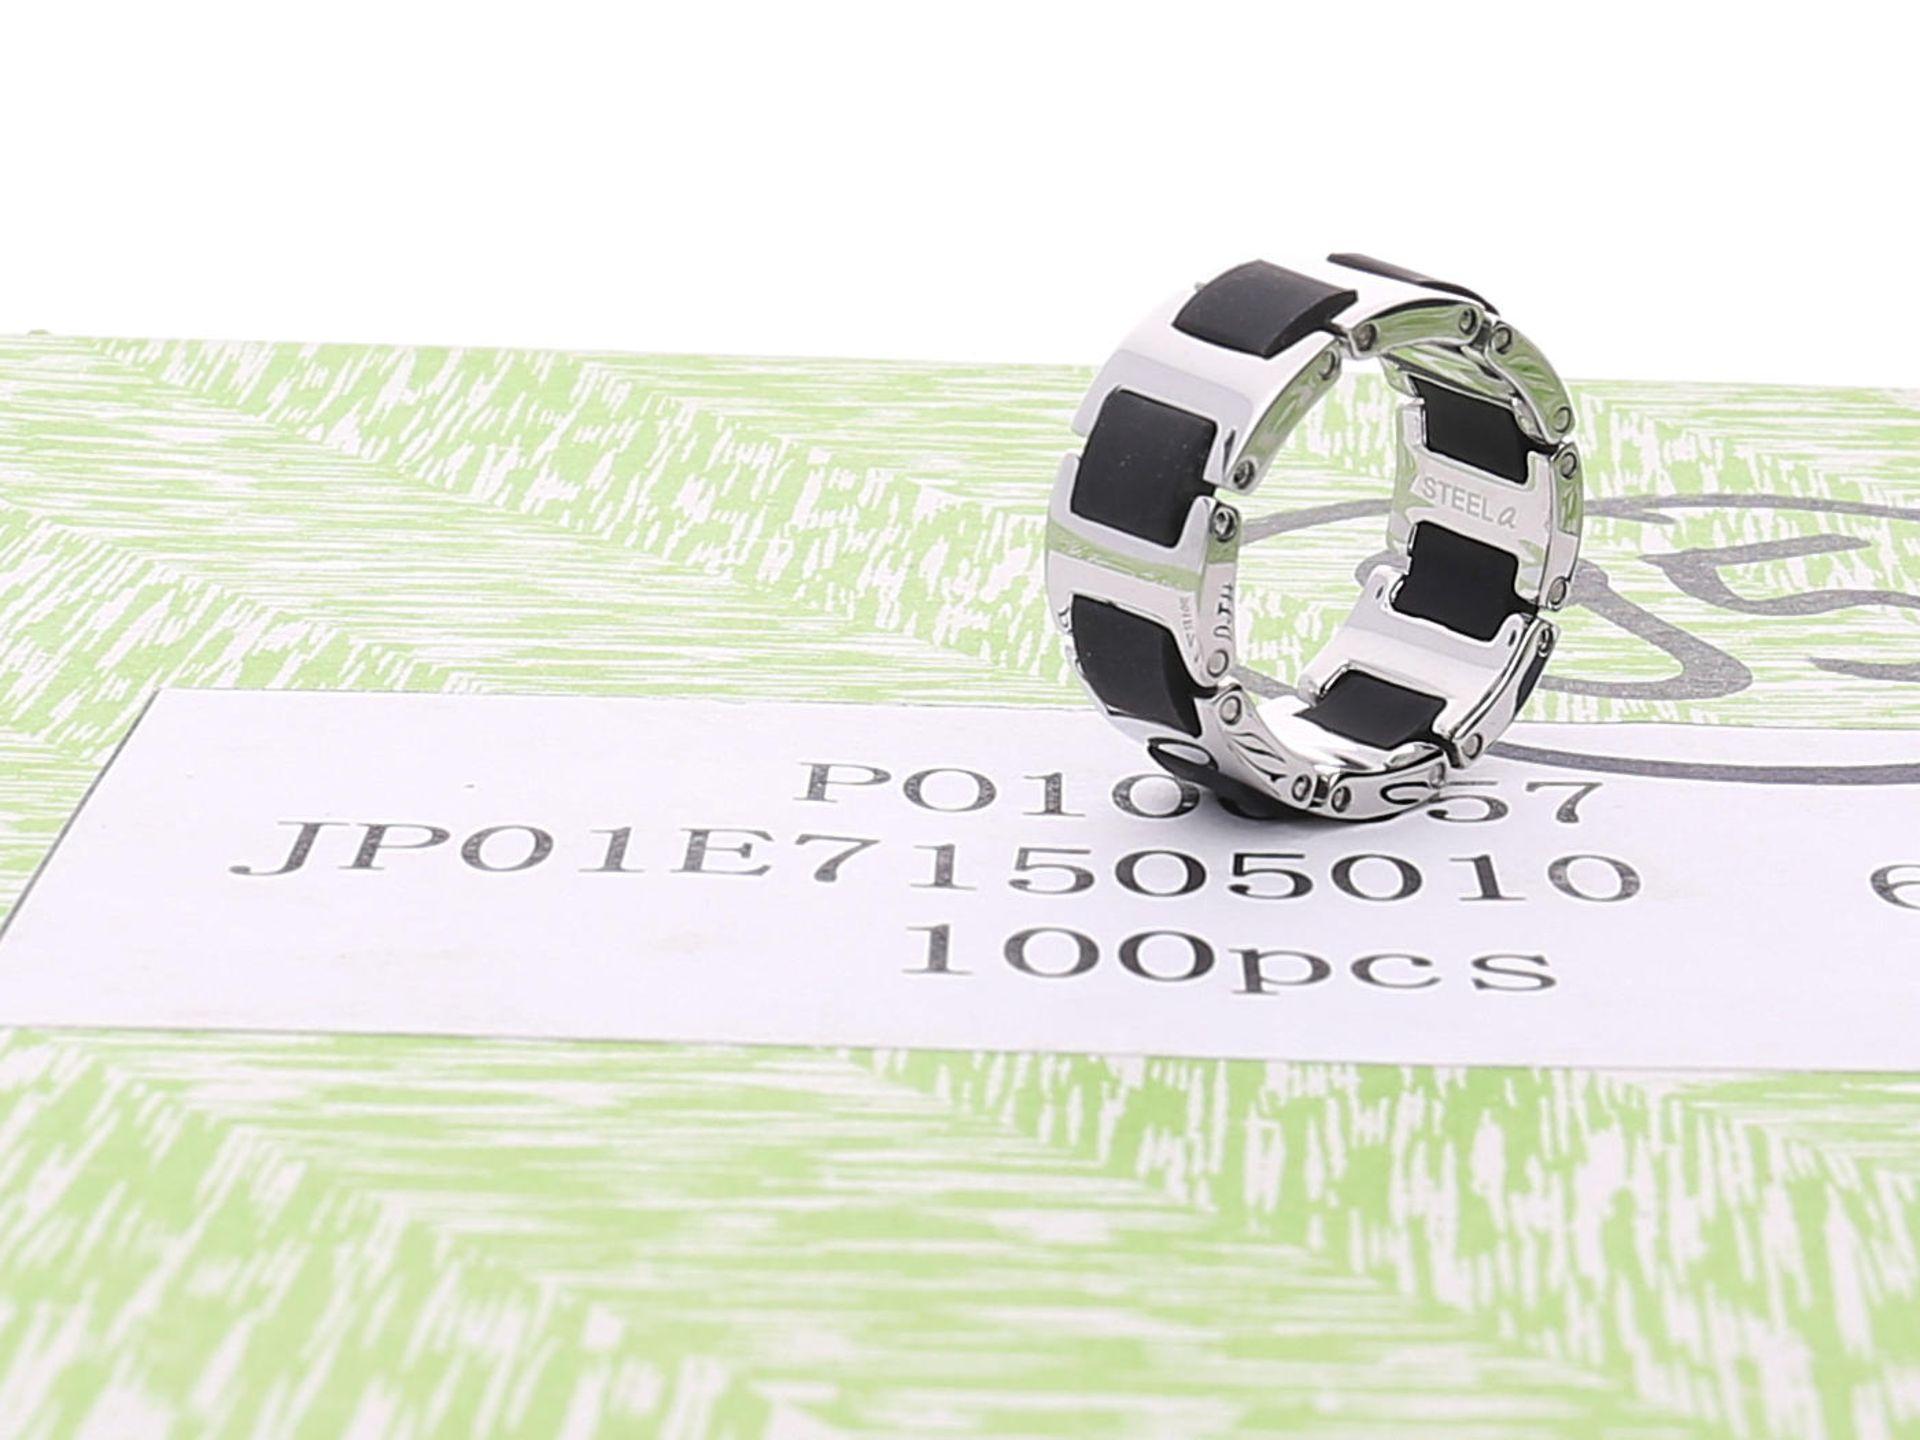 Los 6036 - Ring: neuwertige, ungetragene, originalverpackte Partie Designerringe, s.Oliver Herren-Edelstahl-